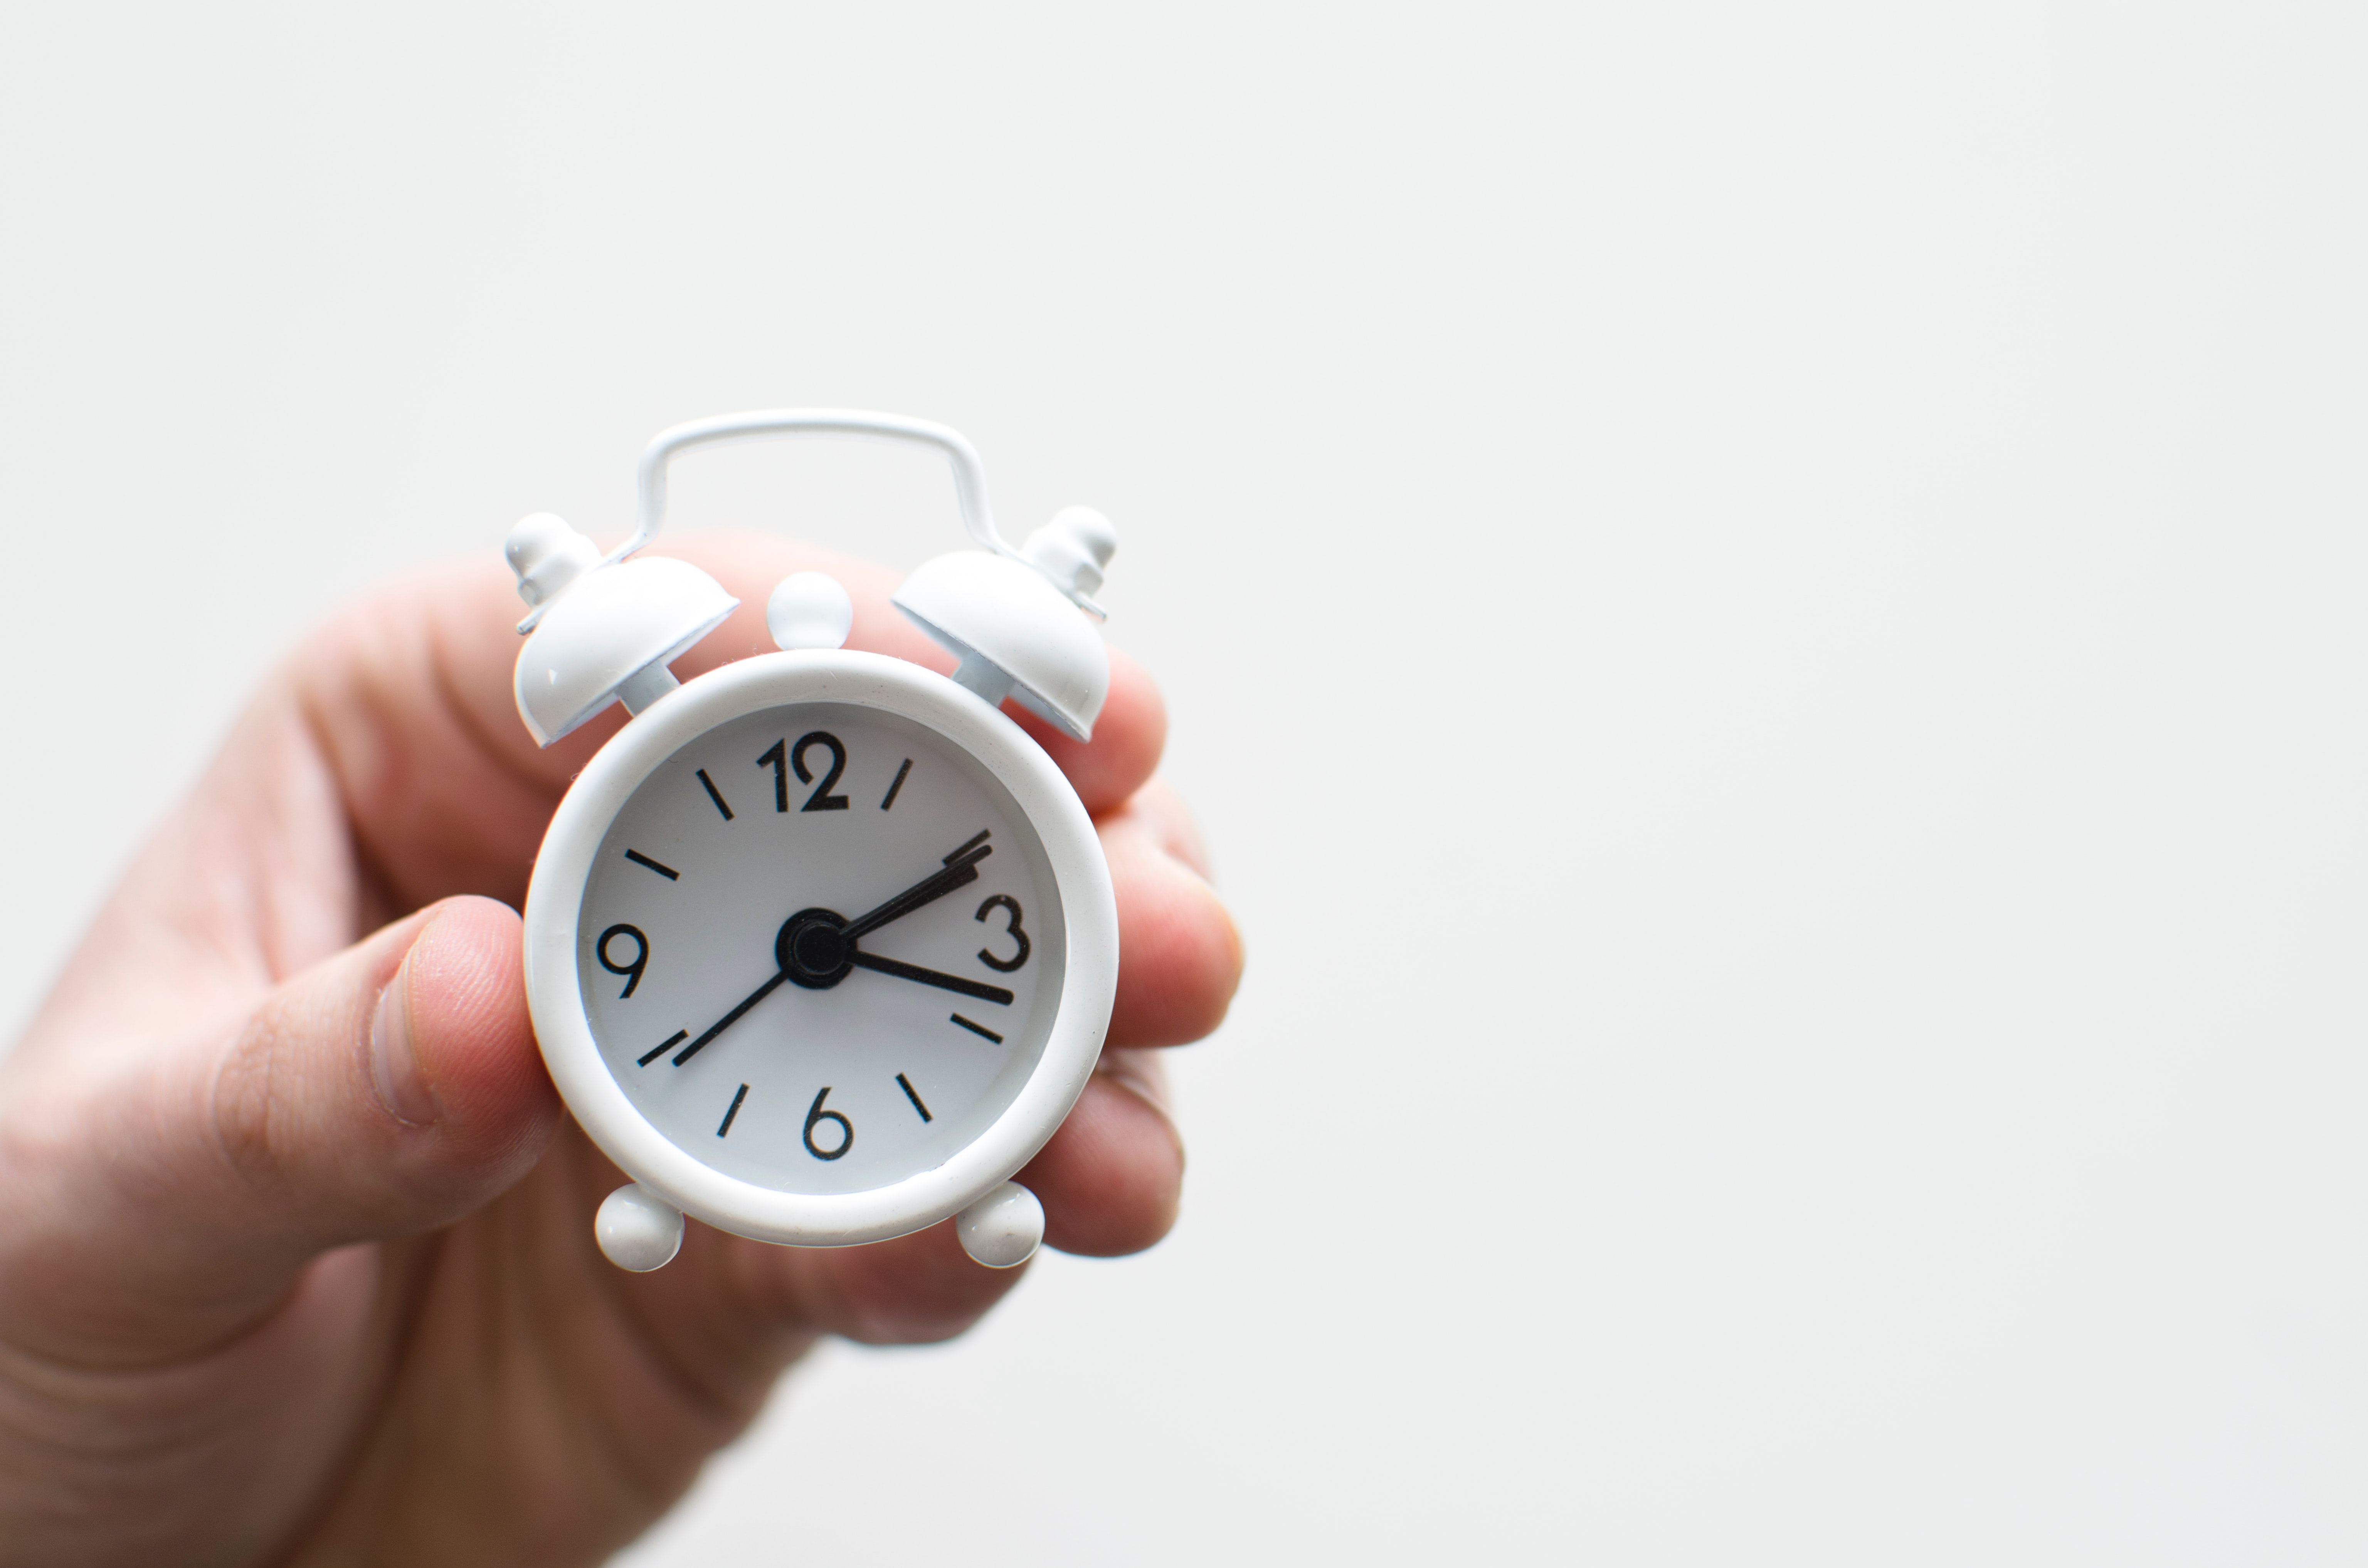 miniature alarm clock